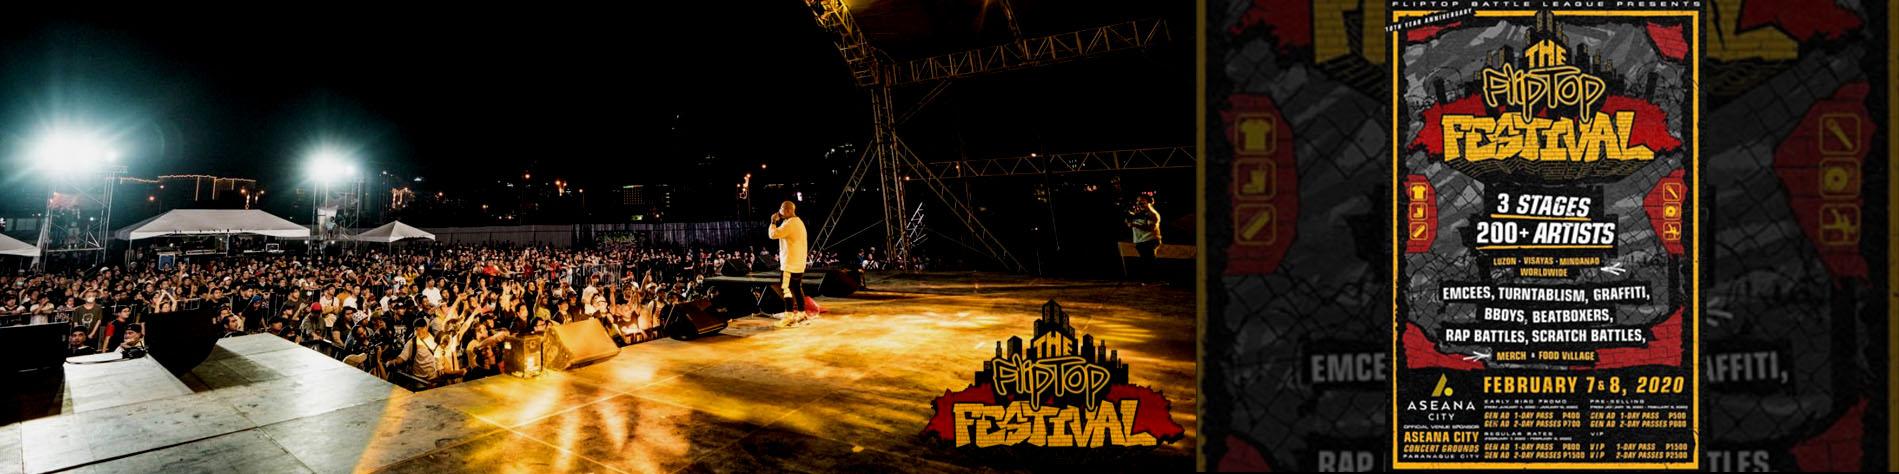 Fliptop Festival 2020